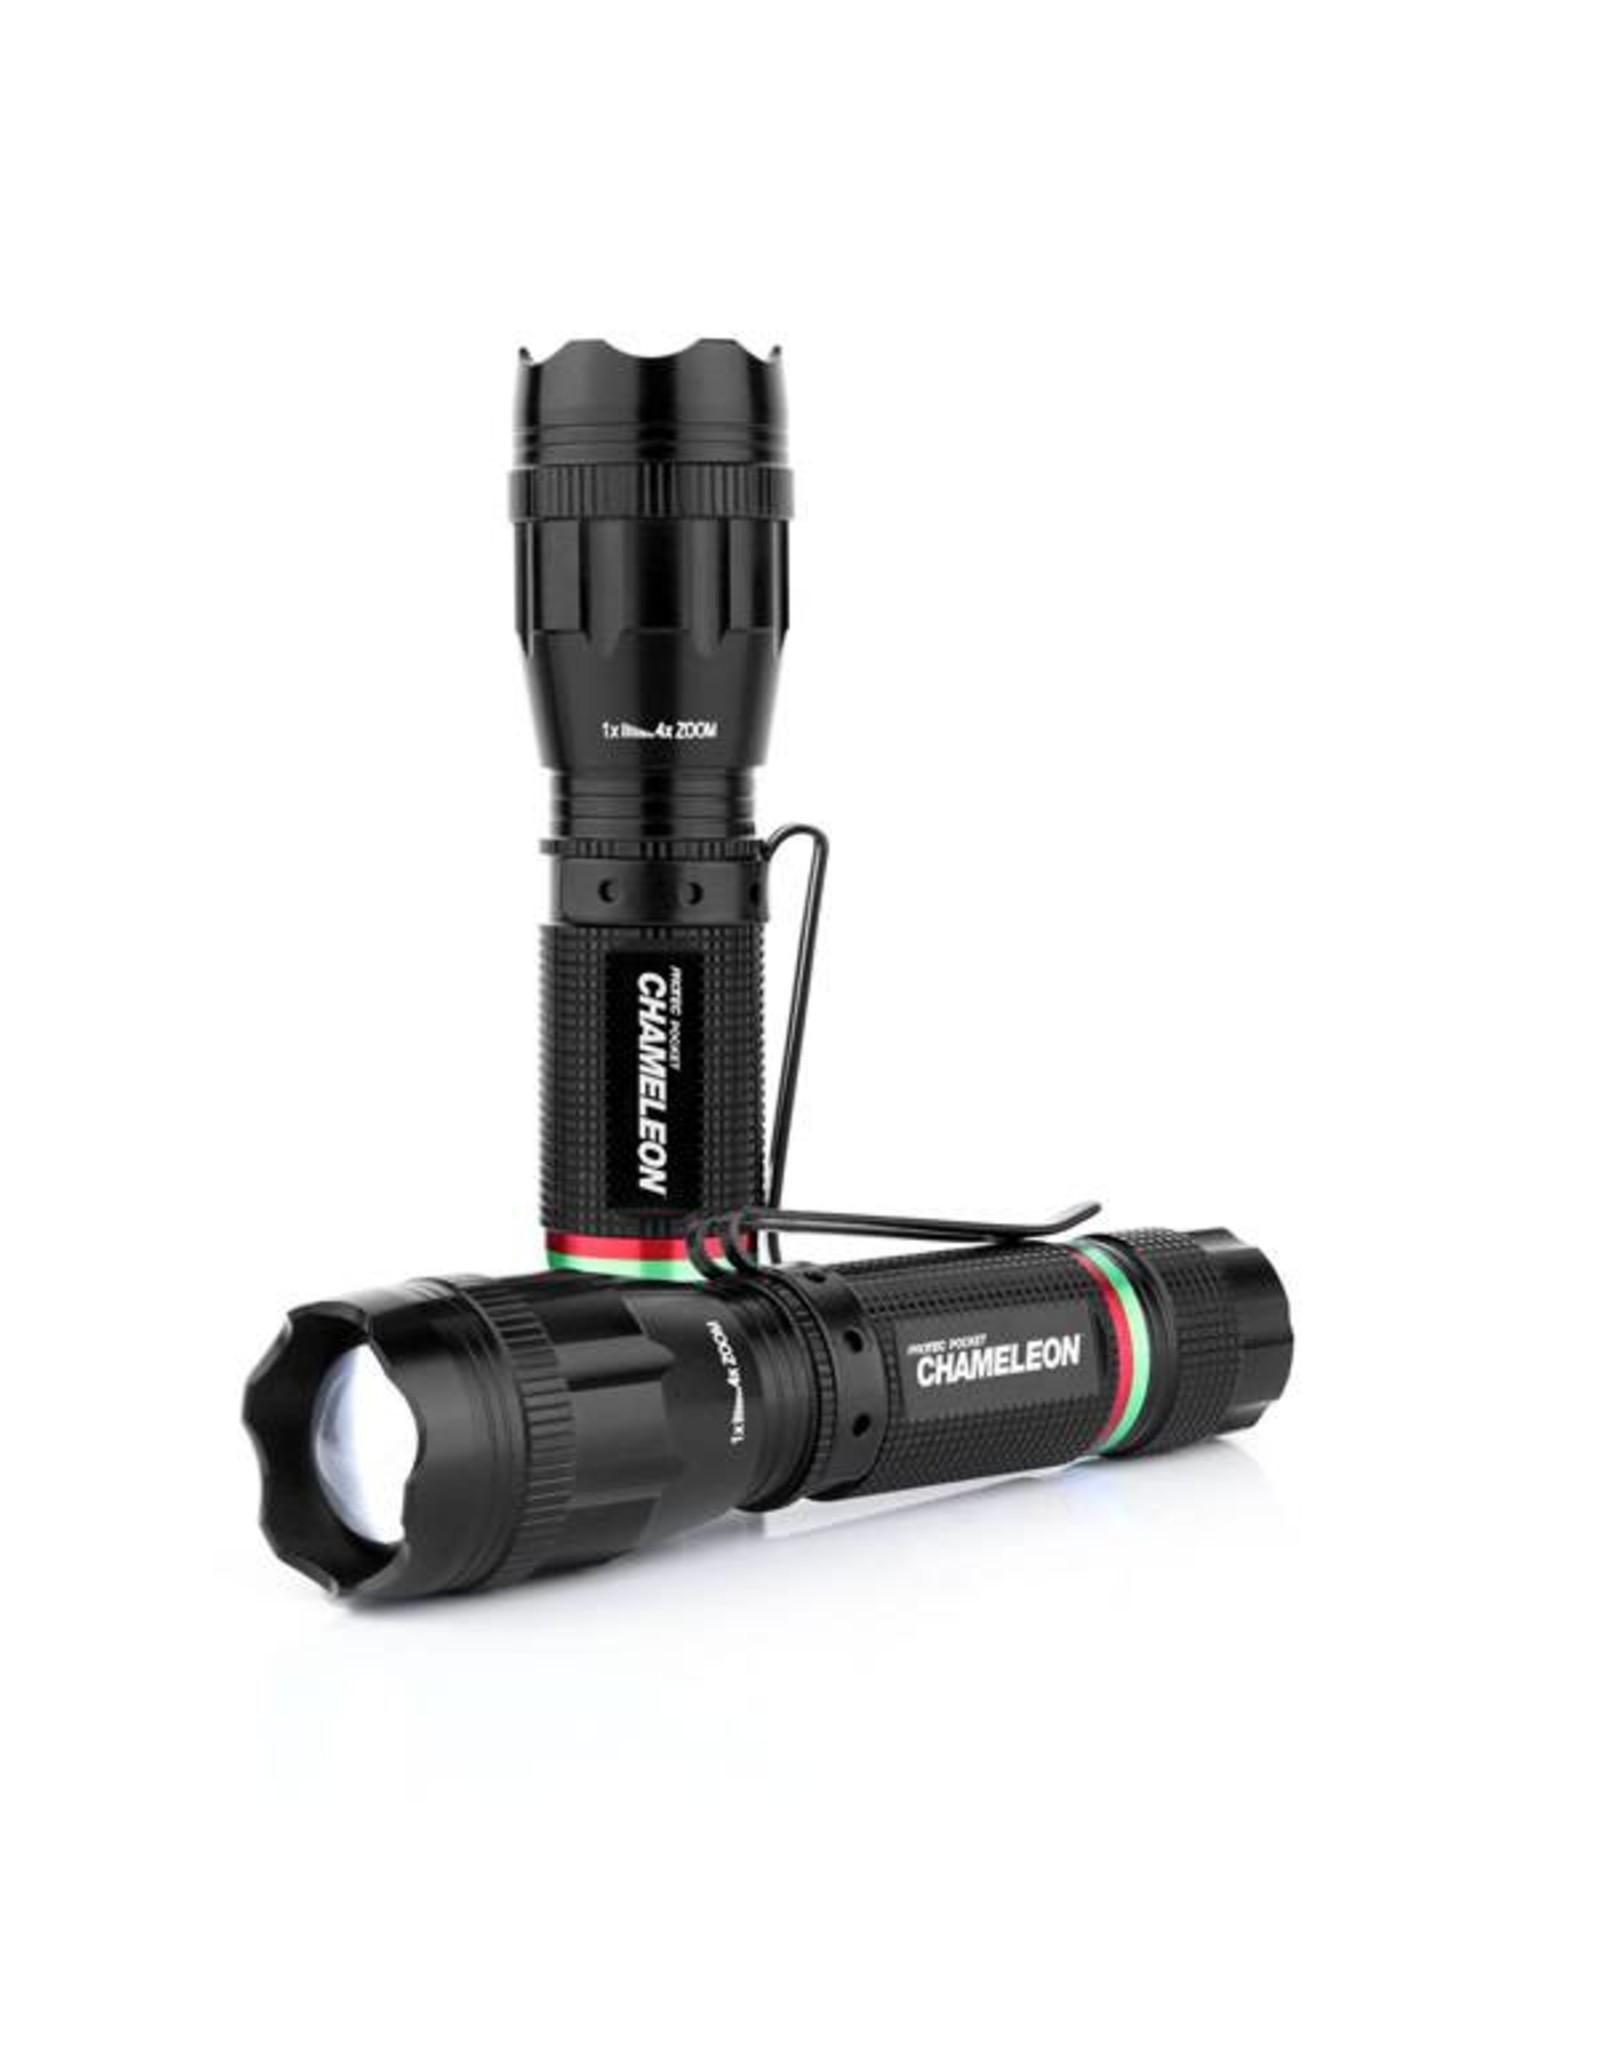 Nebo Chameleon PROTEC Flashlight